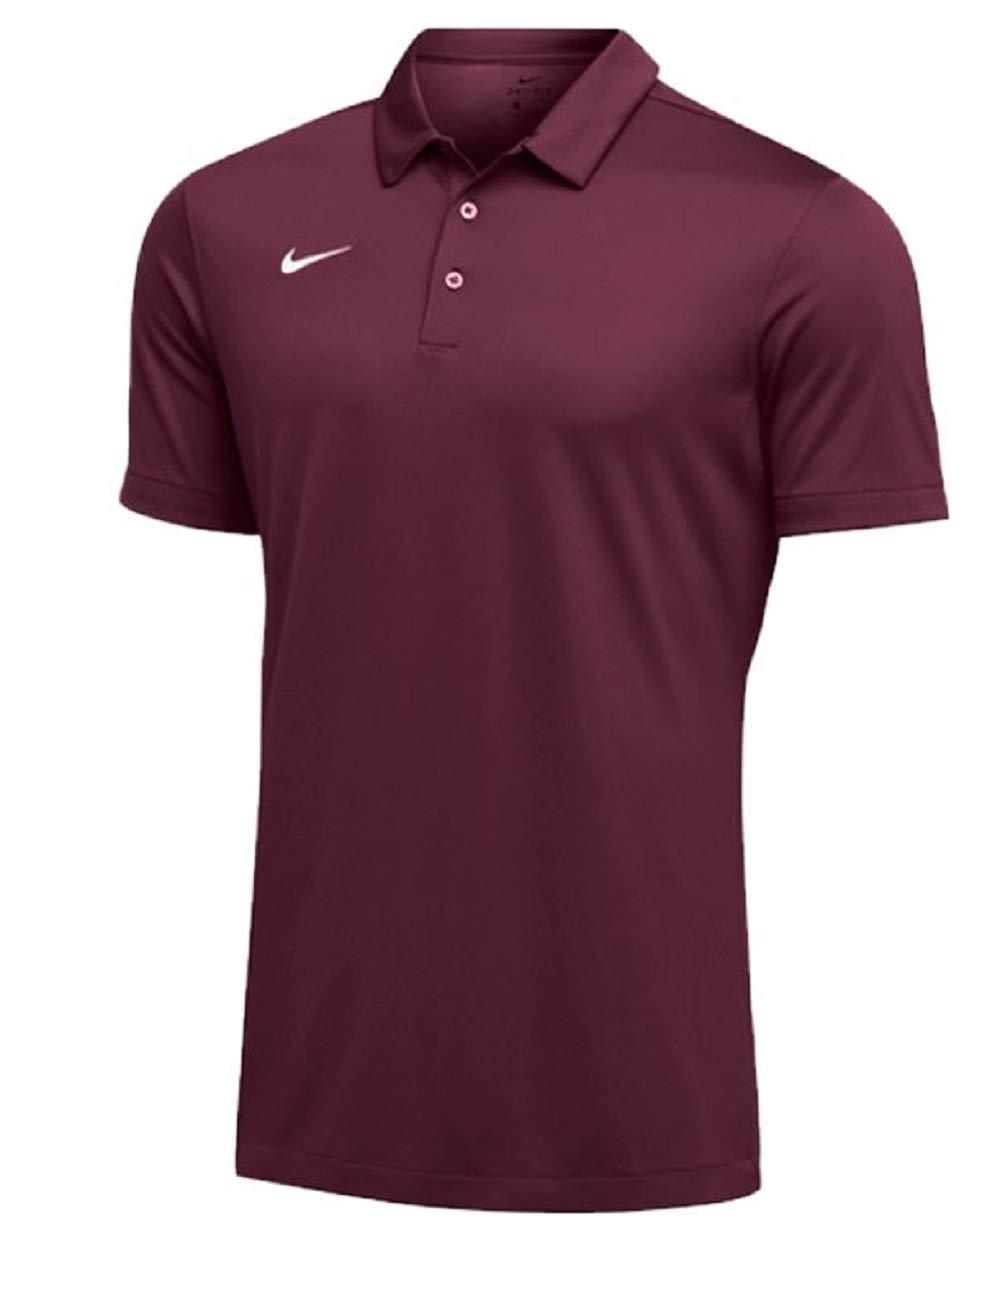 Nike Mens Dri-FIT Short Sleeve Polo Shirt (Small, Maroon)